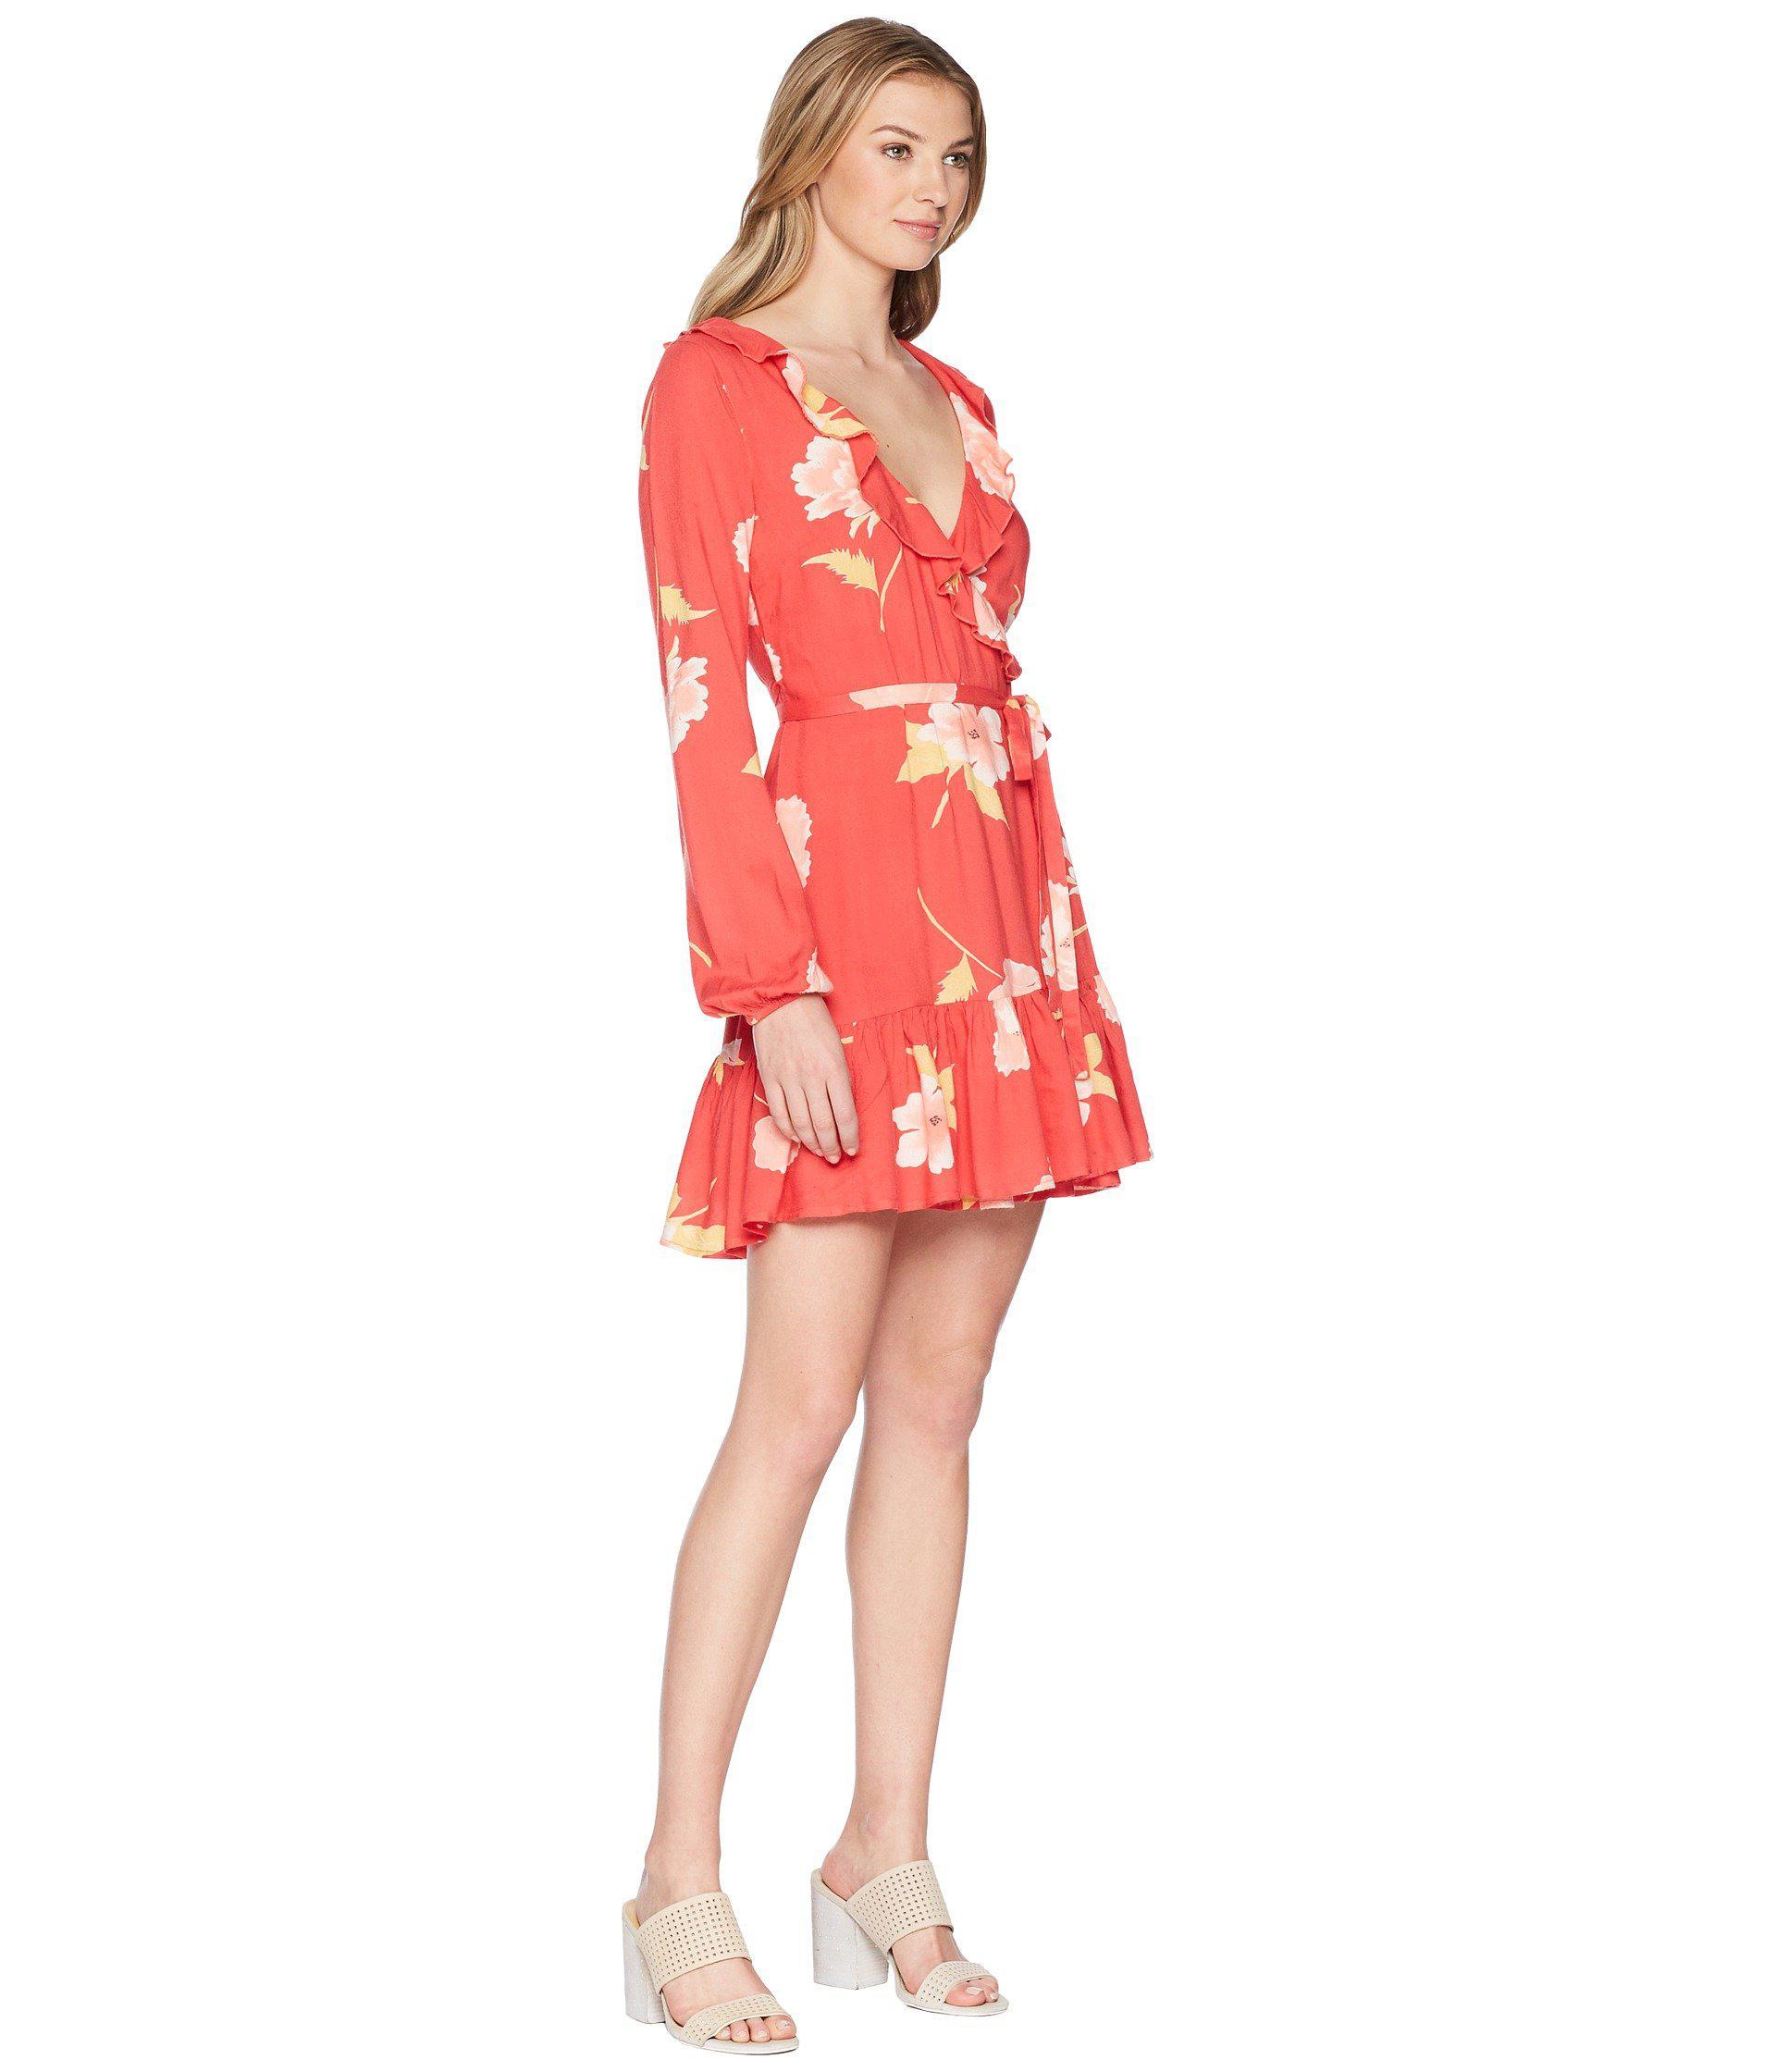 9b03e27f66 Billabong Ruff Girls Club Dress in Red - Lyst